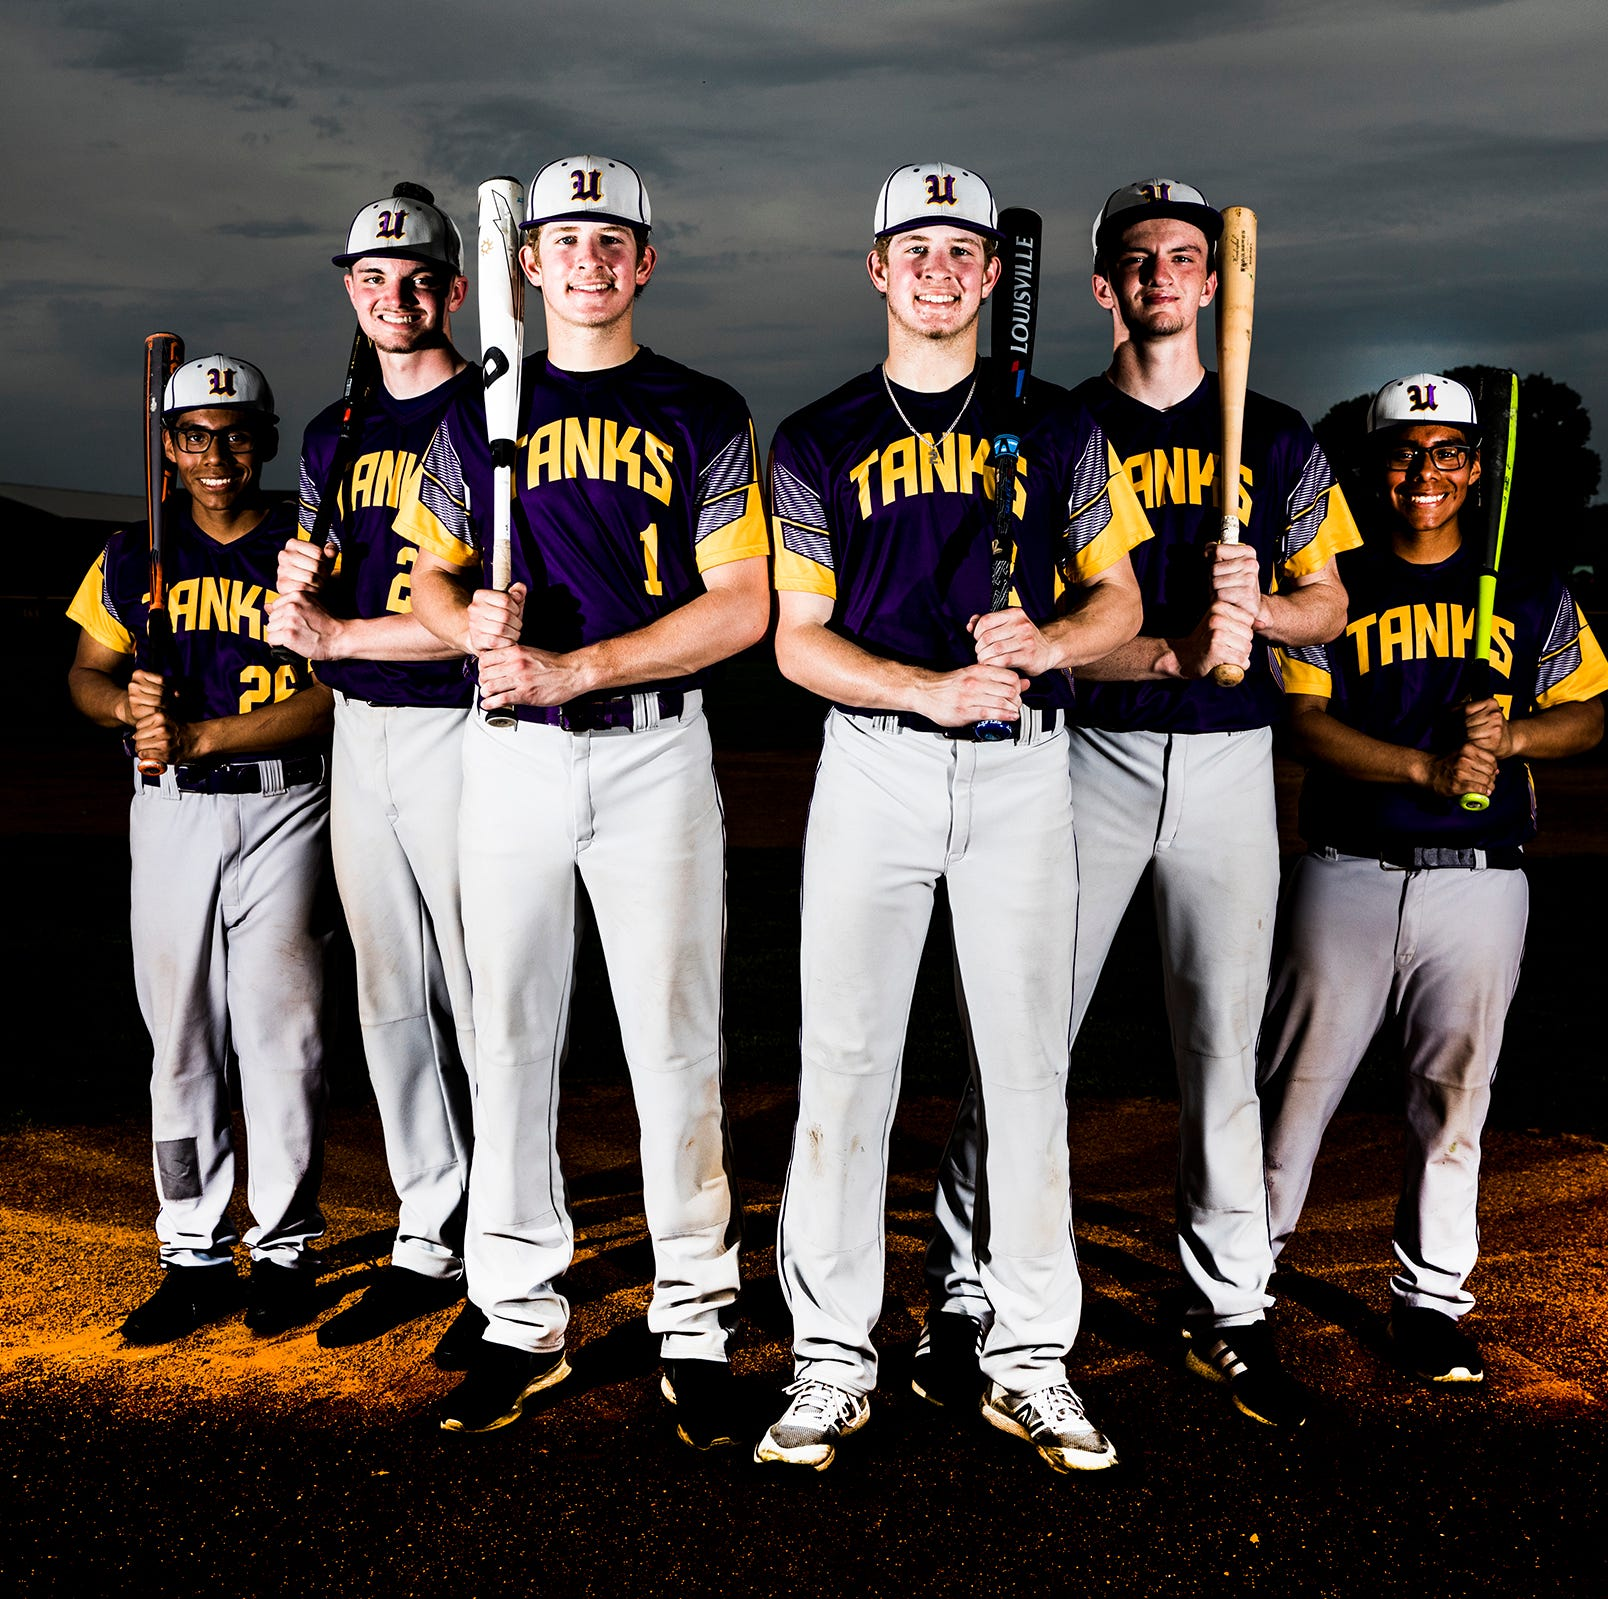 Unioto High School baseball using twin power to find success this season